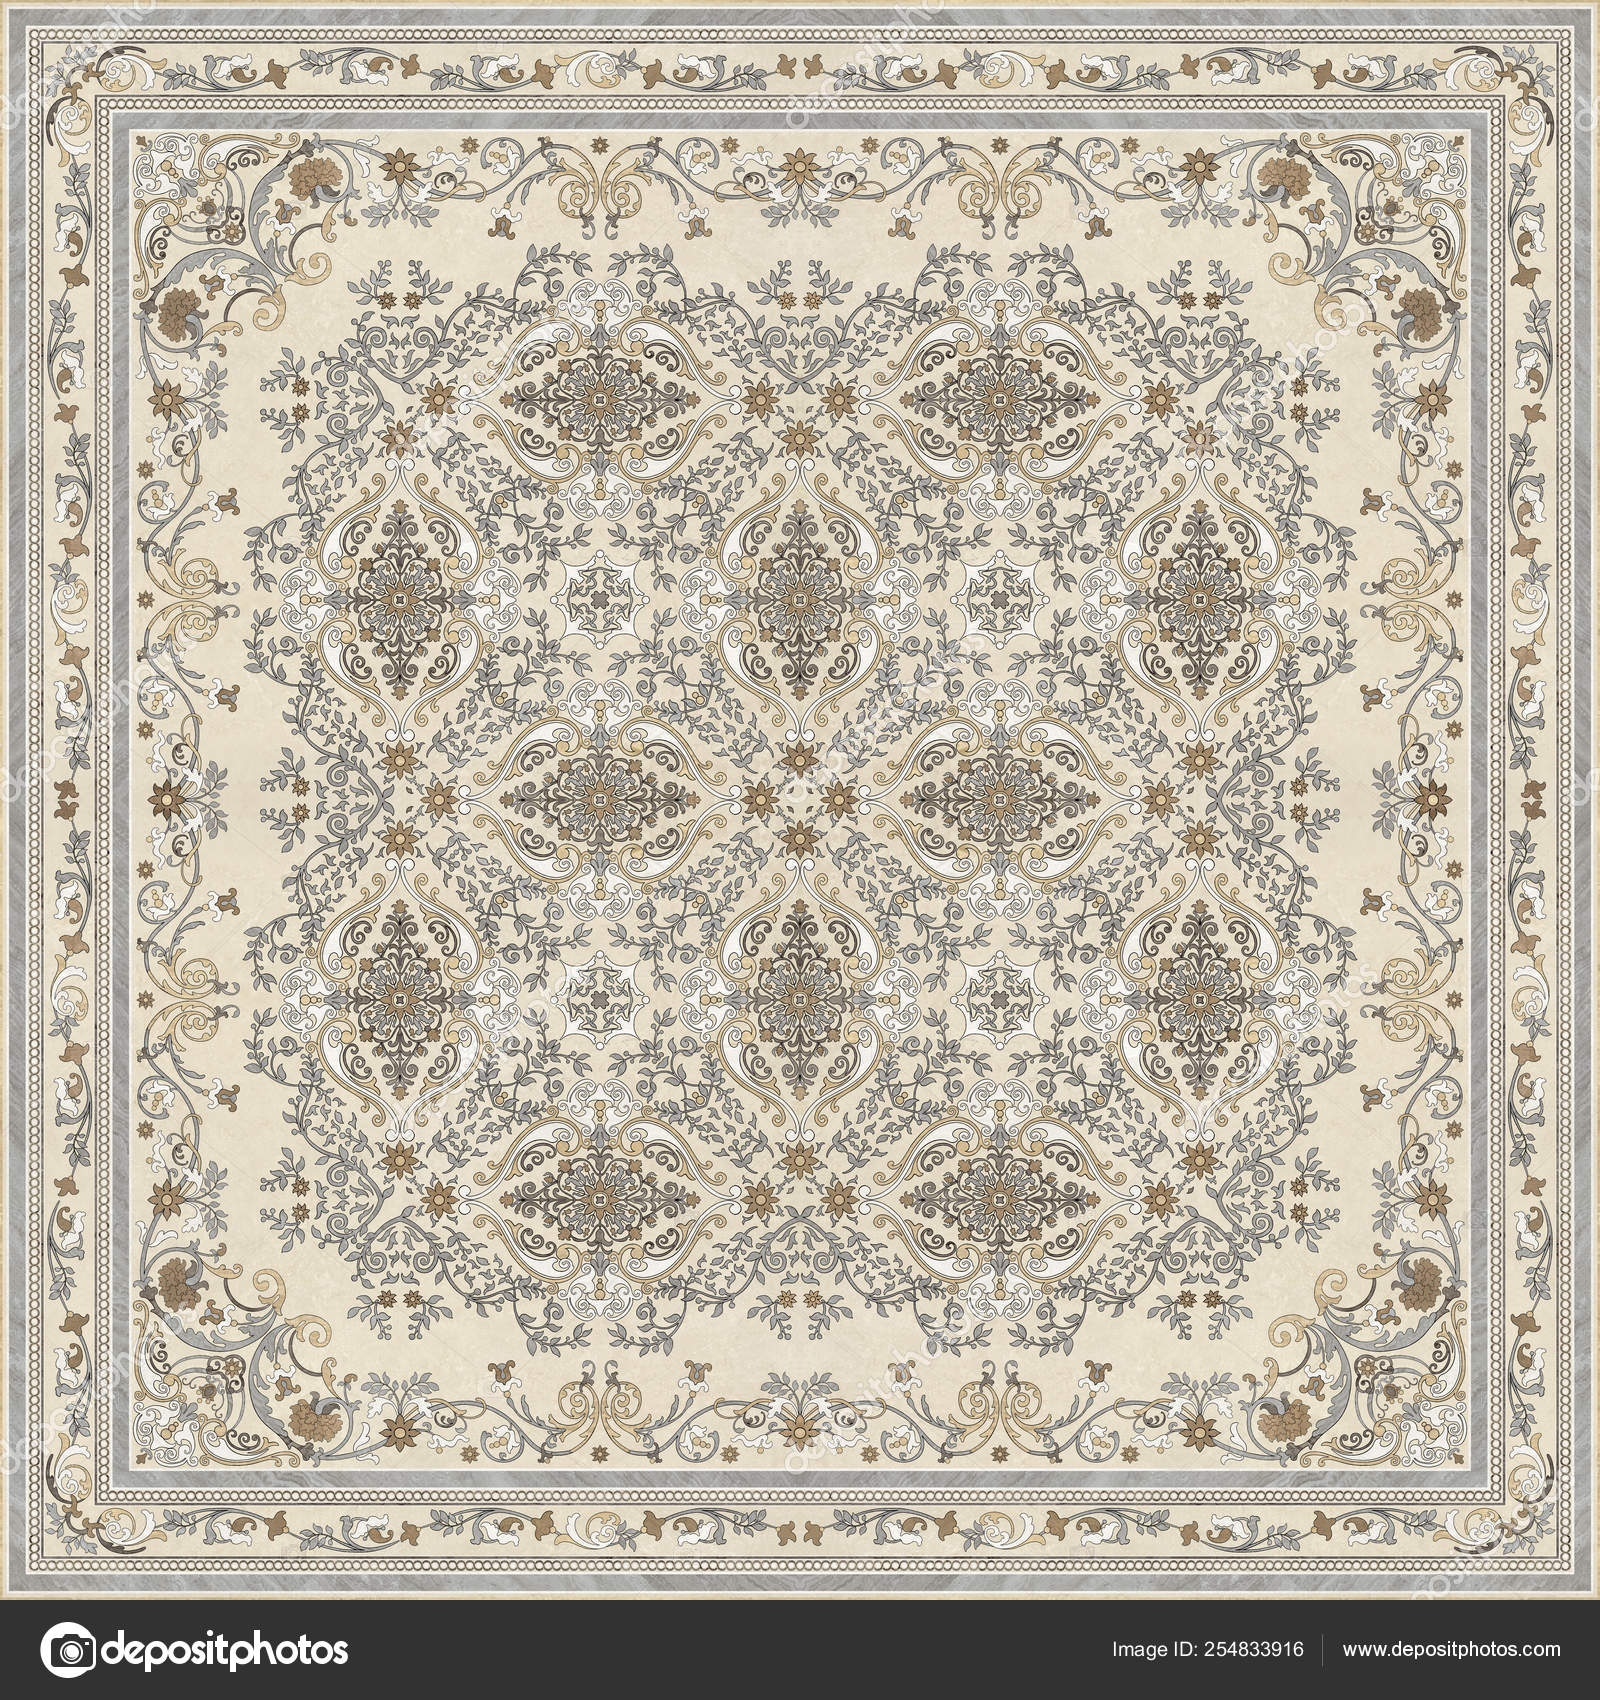 Carpet Texture Abstract Ornament Modern Trendy Ancient Motifs Carpet Rug Stock Photo C Av Designer 254833916